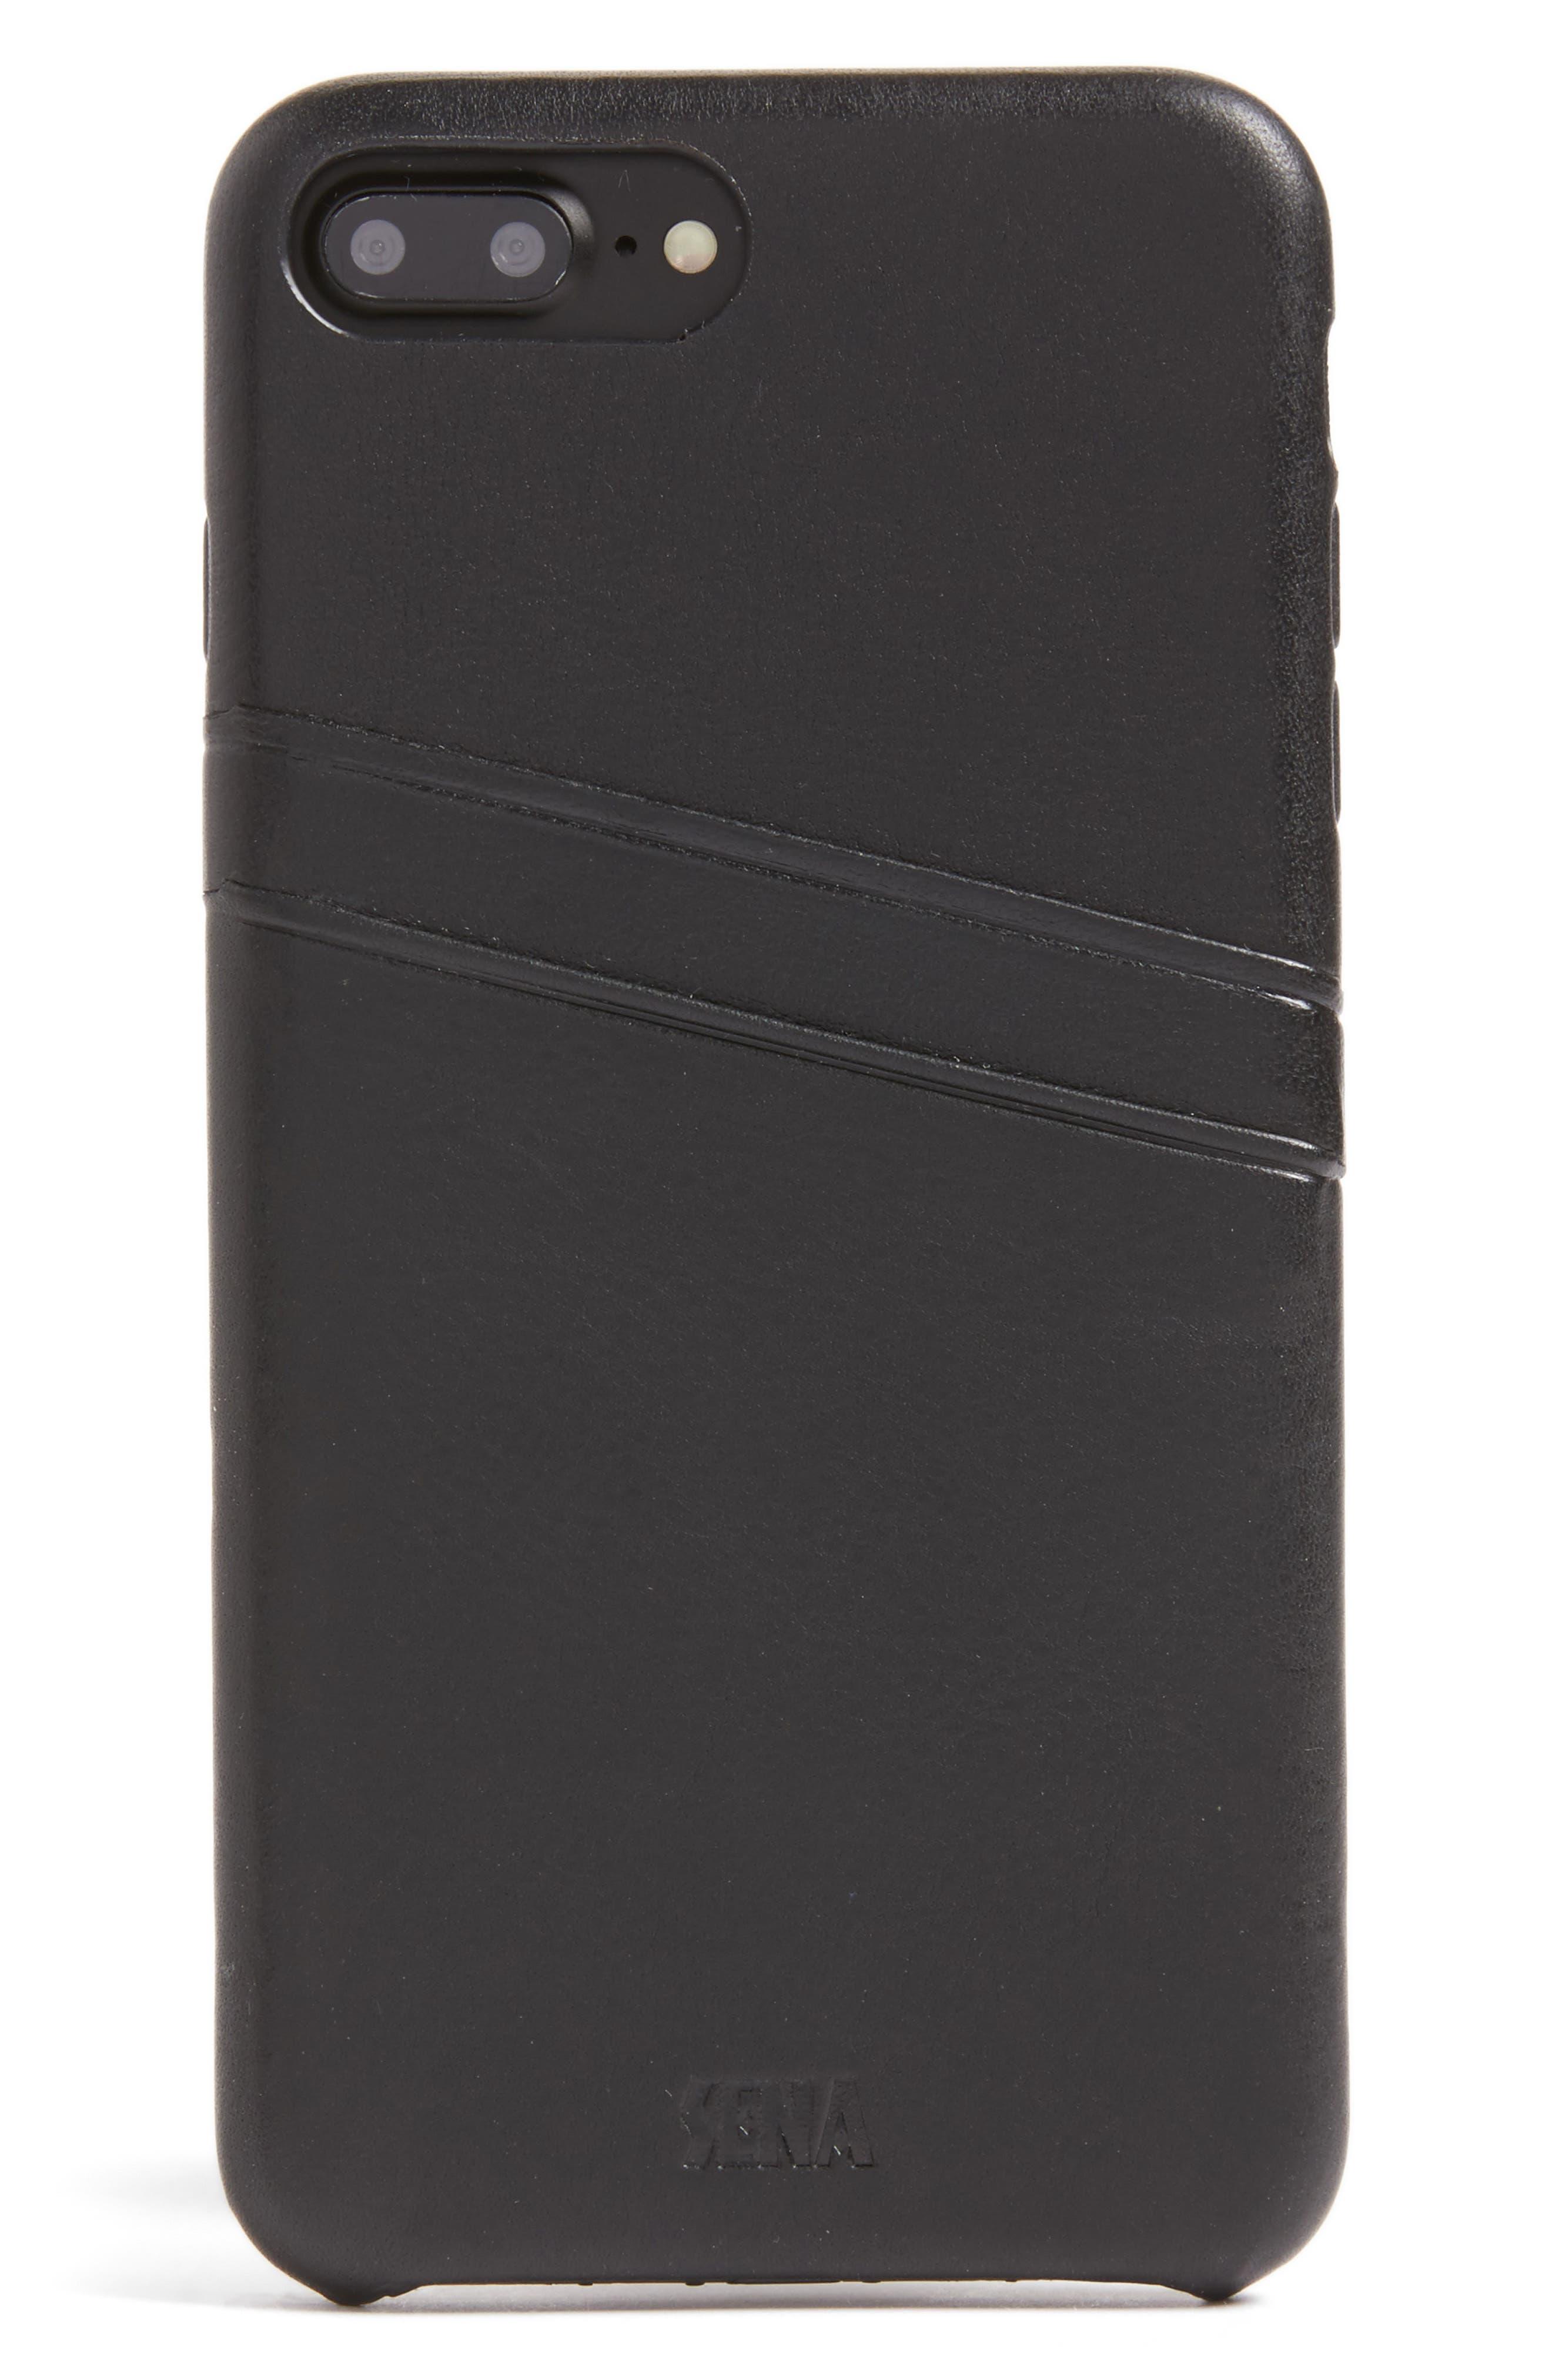 Sena iPhone 7 Plus Snap-On Wallet Case